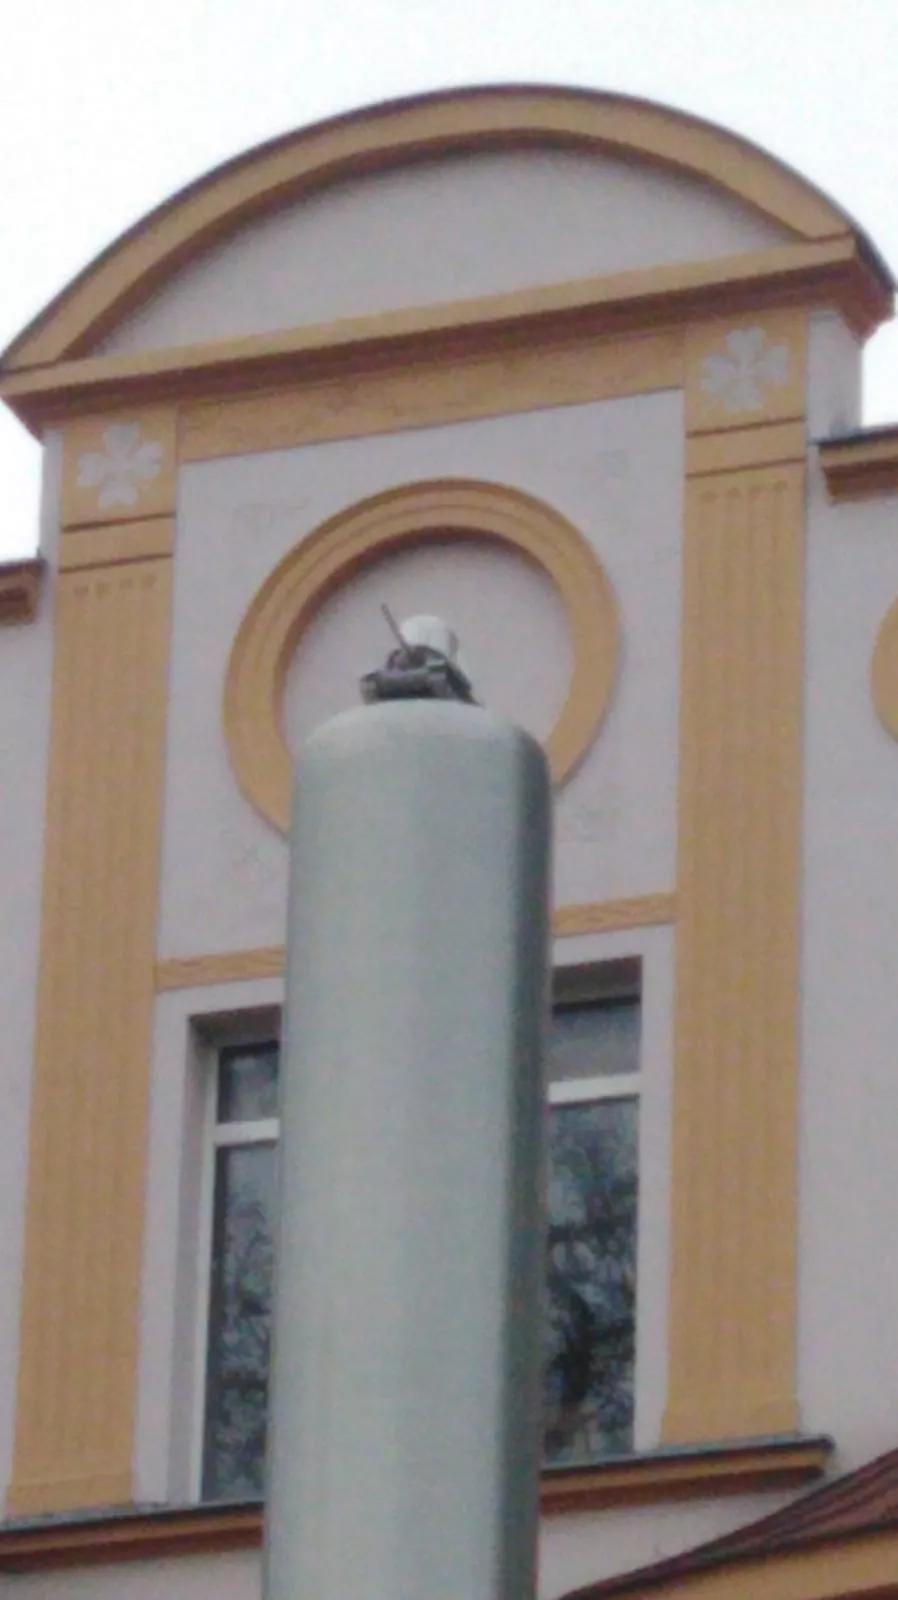 20200430-В Праге установлена памятная доска «власовцам»-pic11